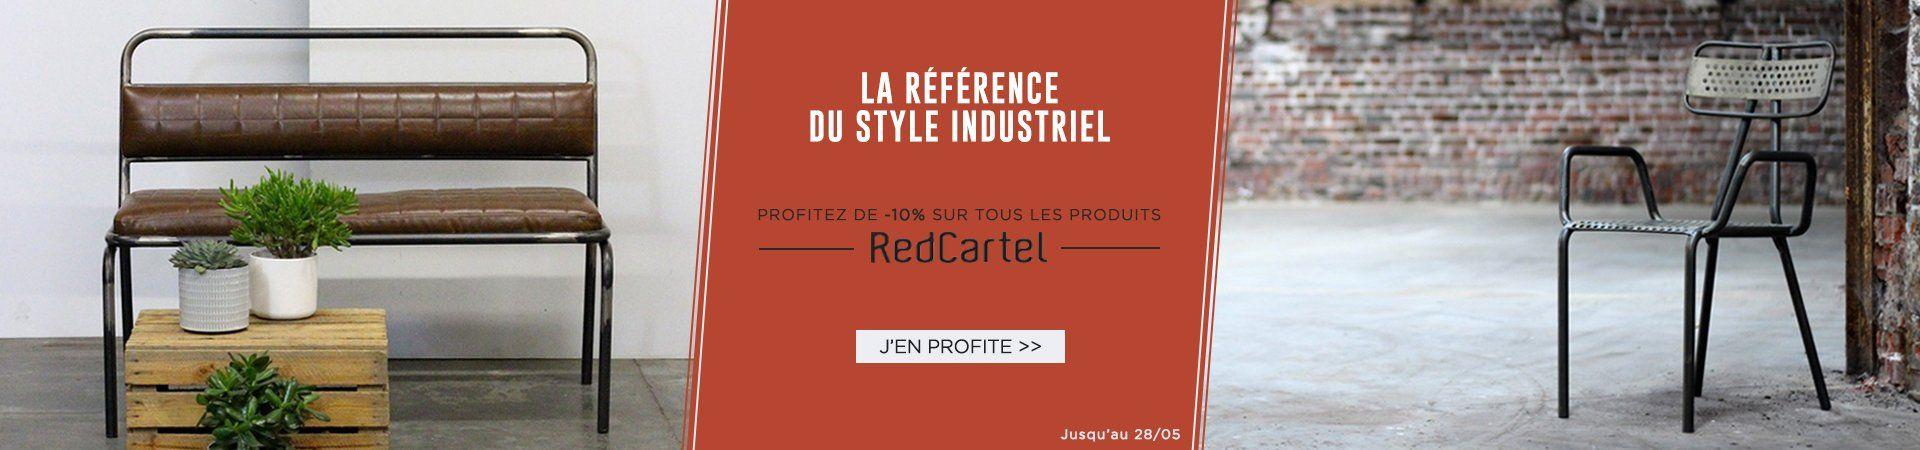 La marque The Red Cartel en promo cette semaine